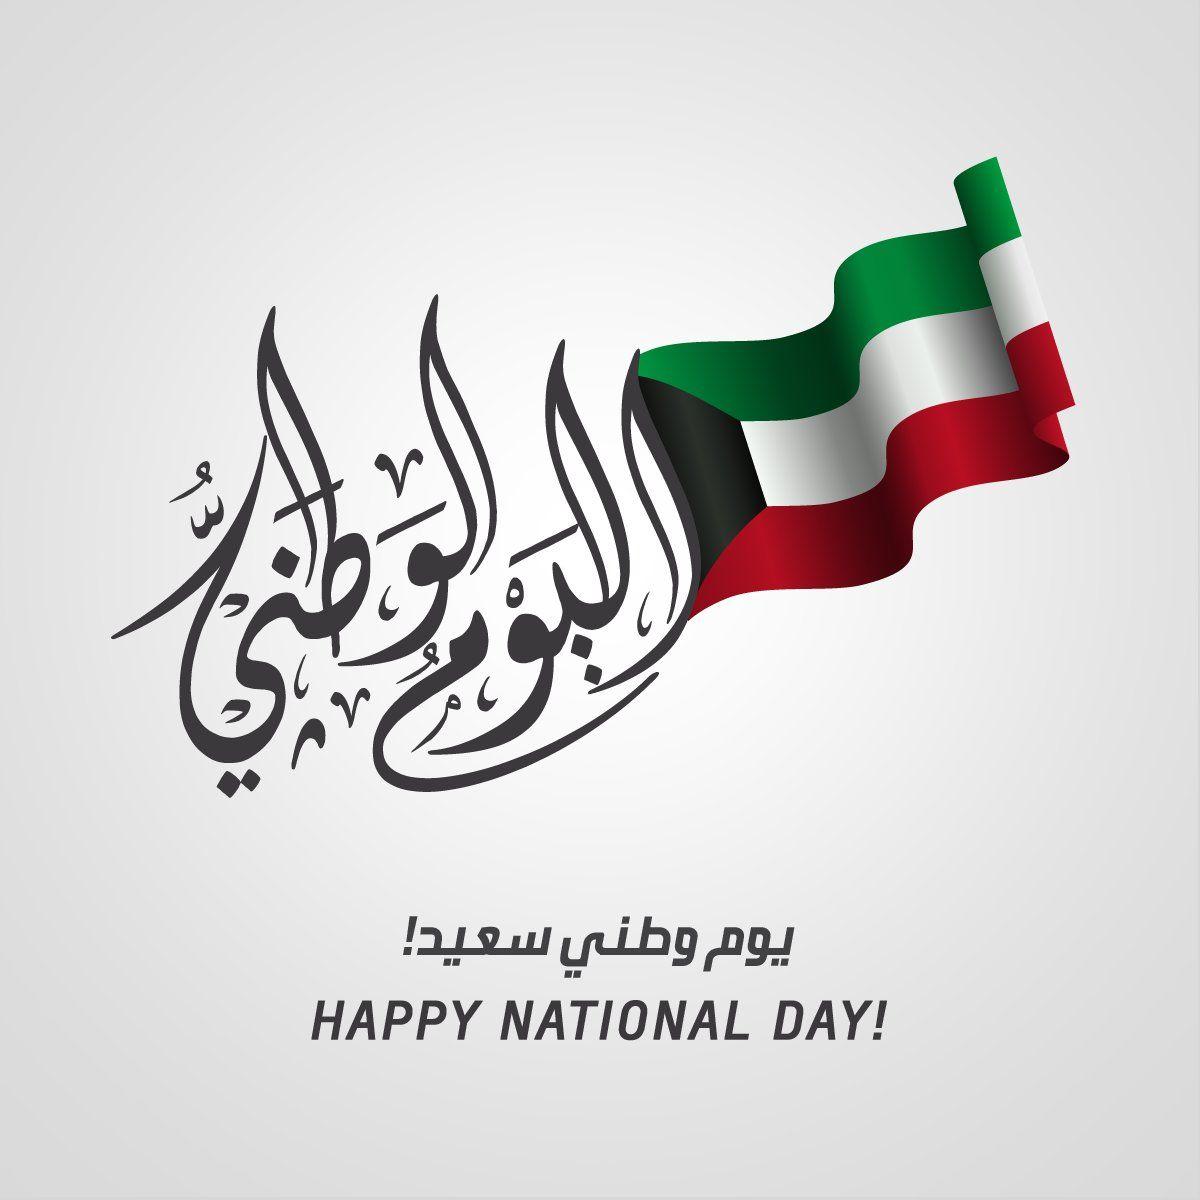 Kuwait Kuwait National Day Happy National Day National Day